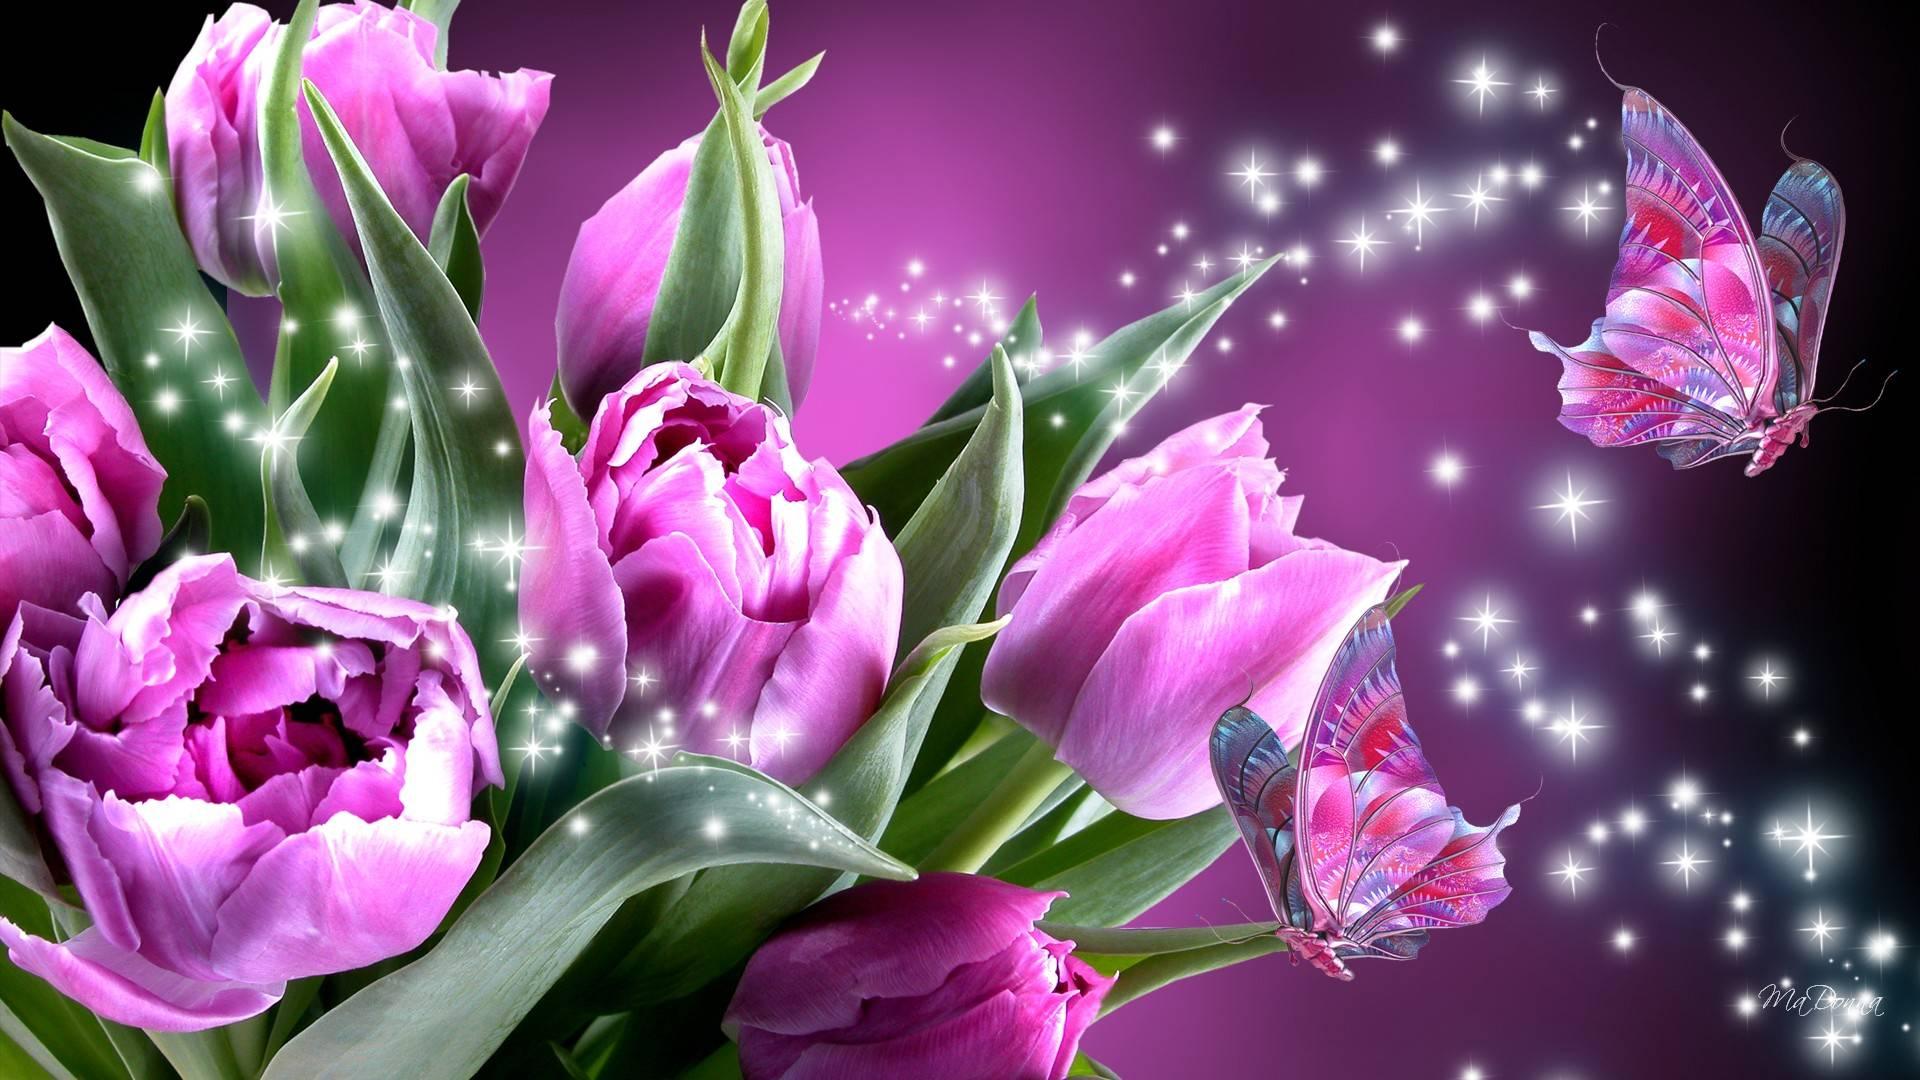 flowers devine wallpaper - photo #39